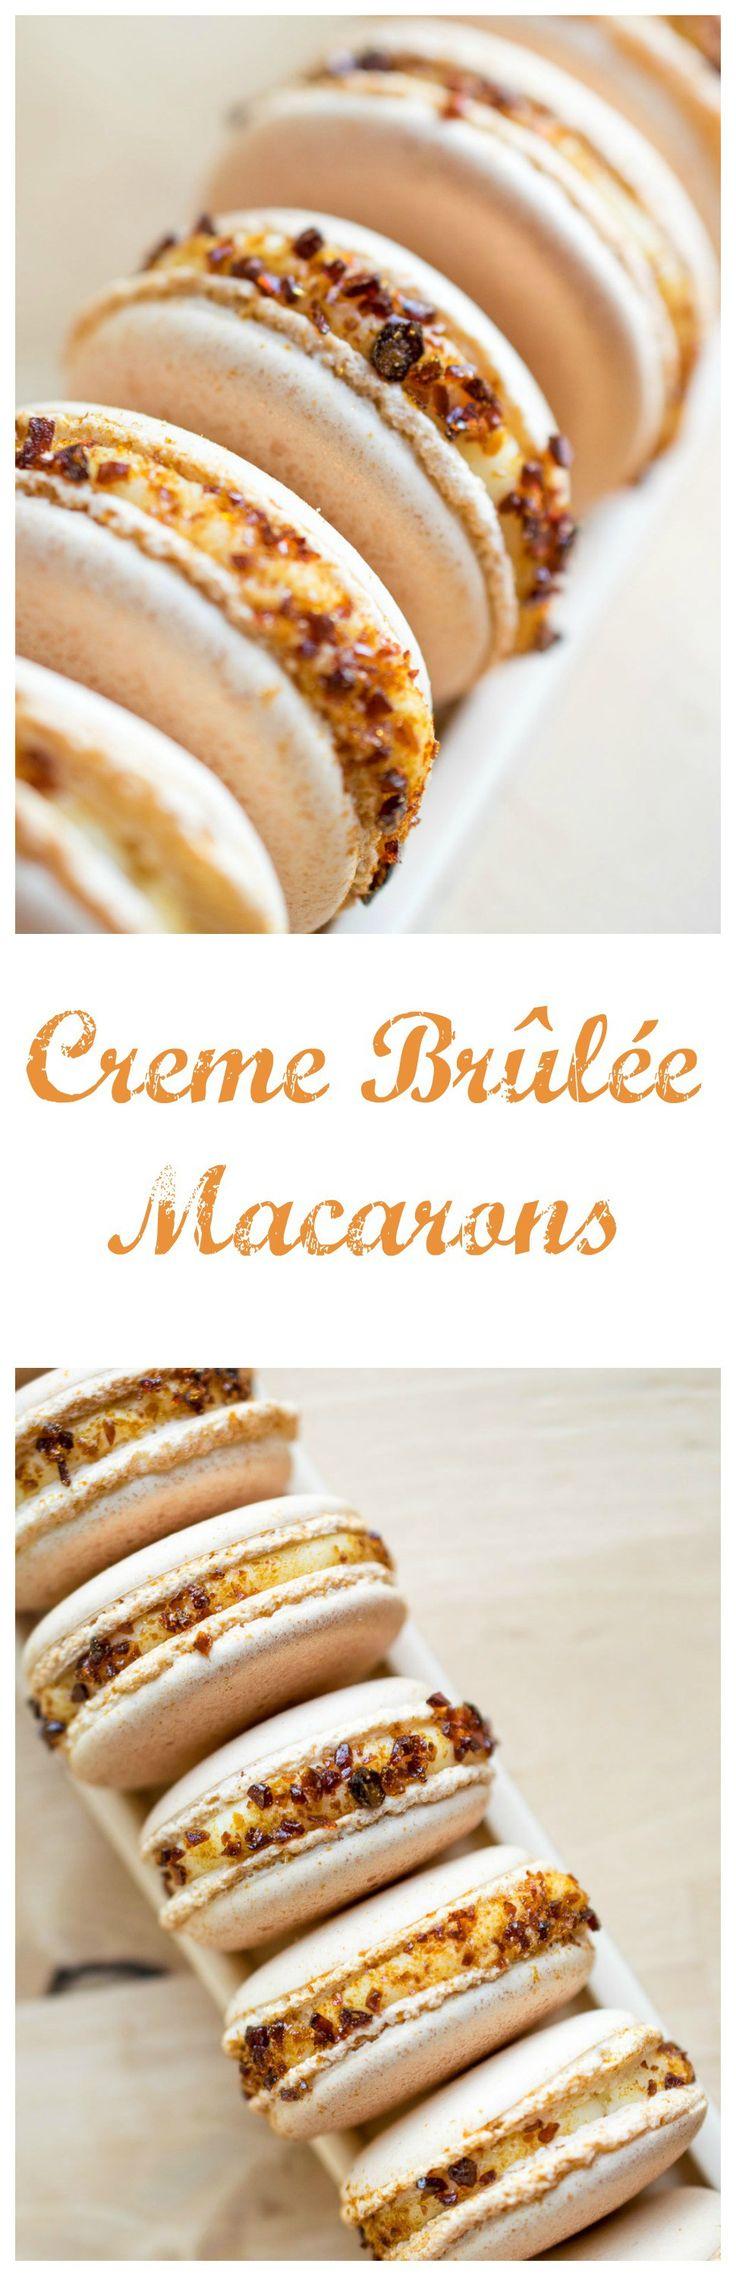 creme brulee macarons                                                                                                                                                     More